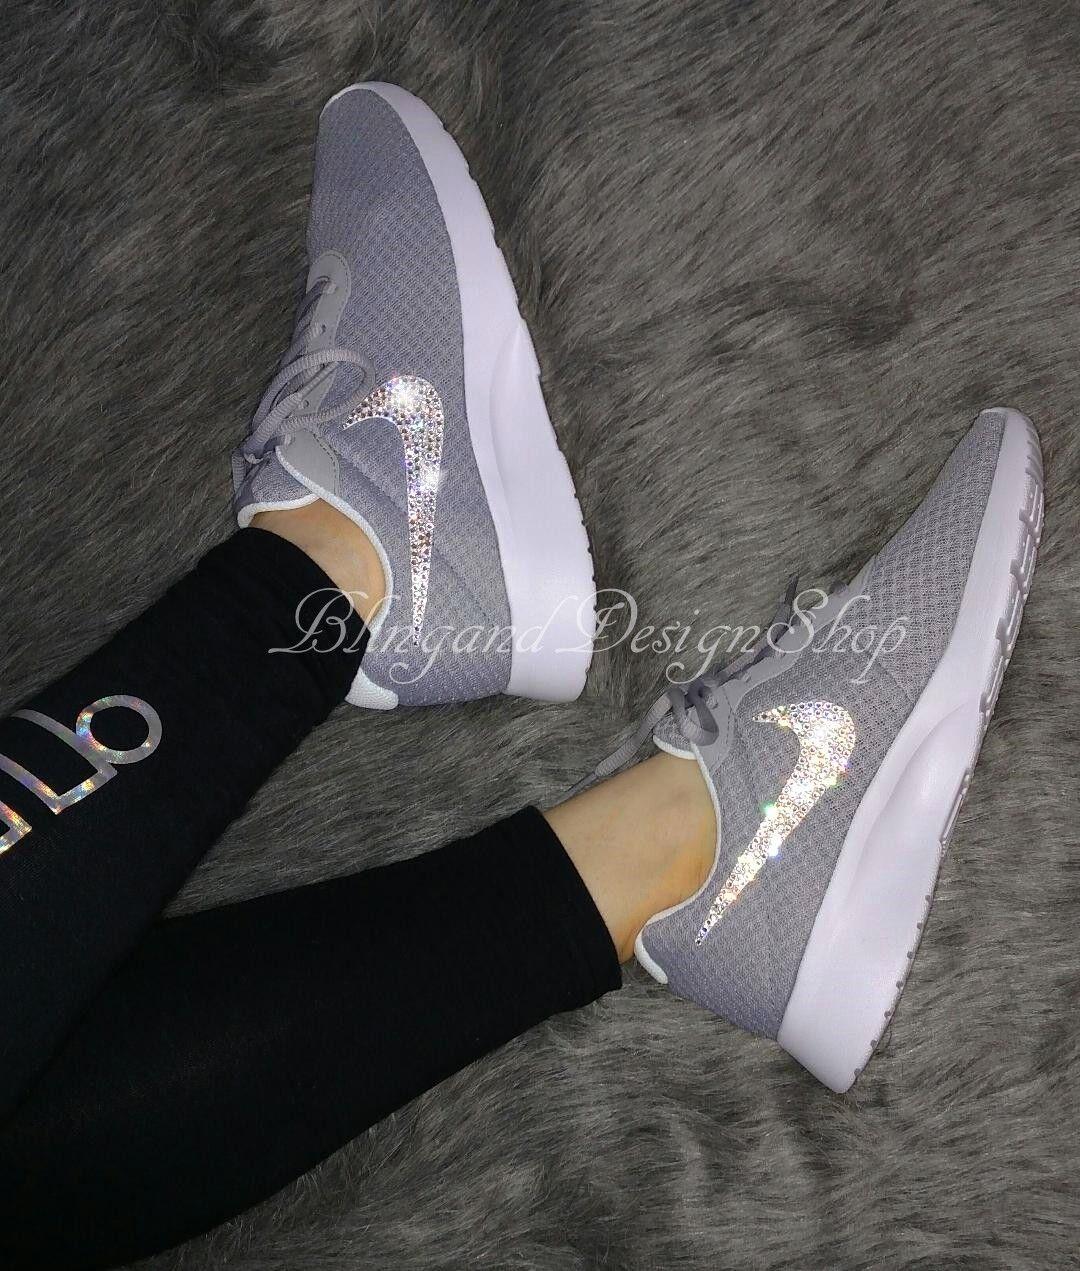 NWT Women's Nike Tanjun Shoe Custom with Bling Swarovski Crystals New in Box